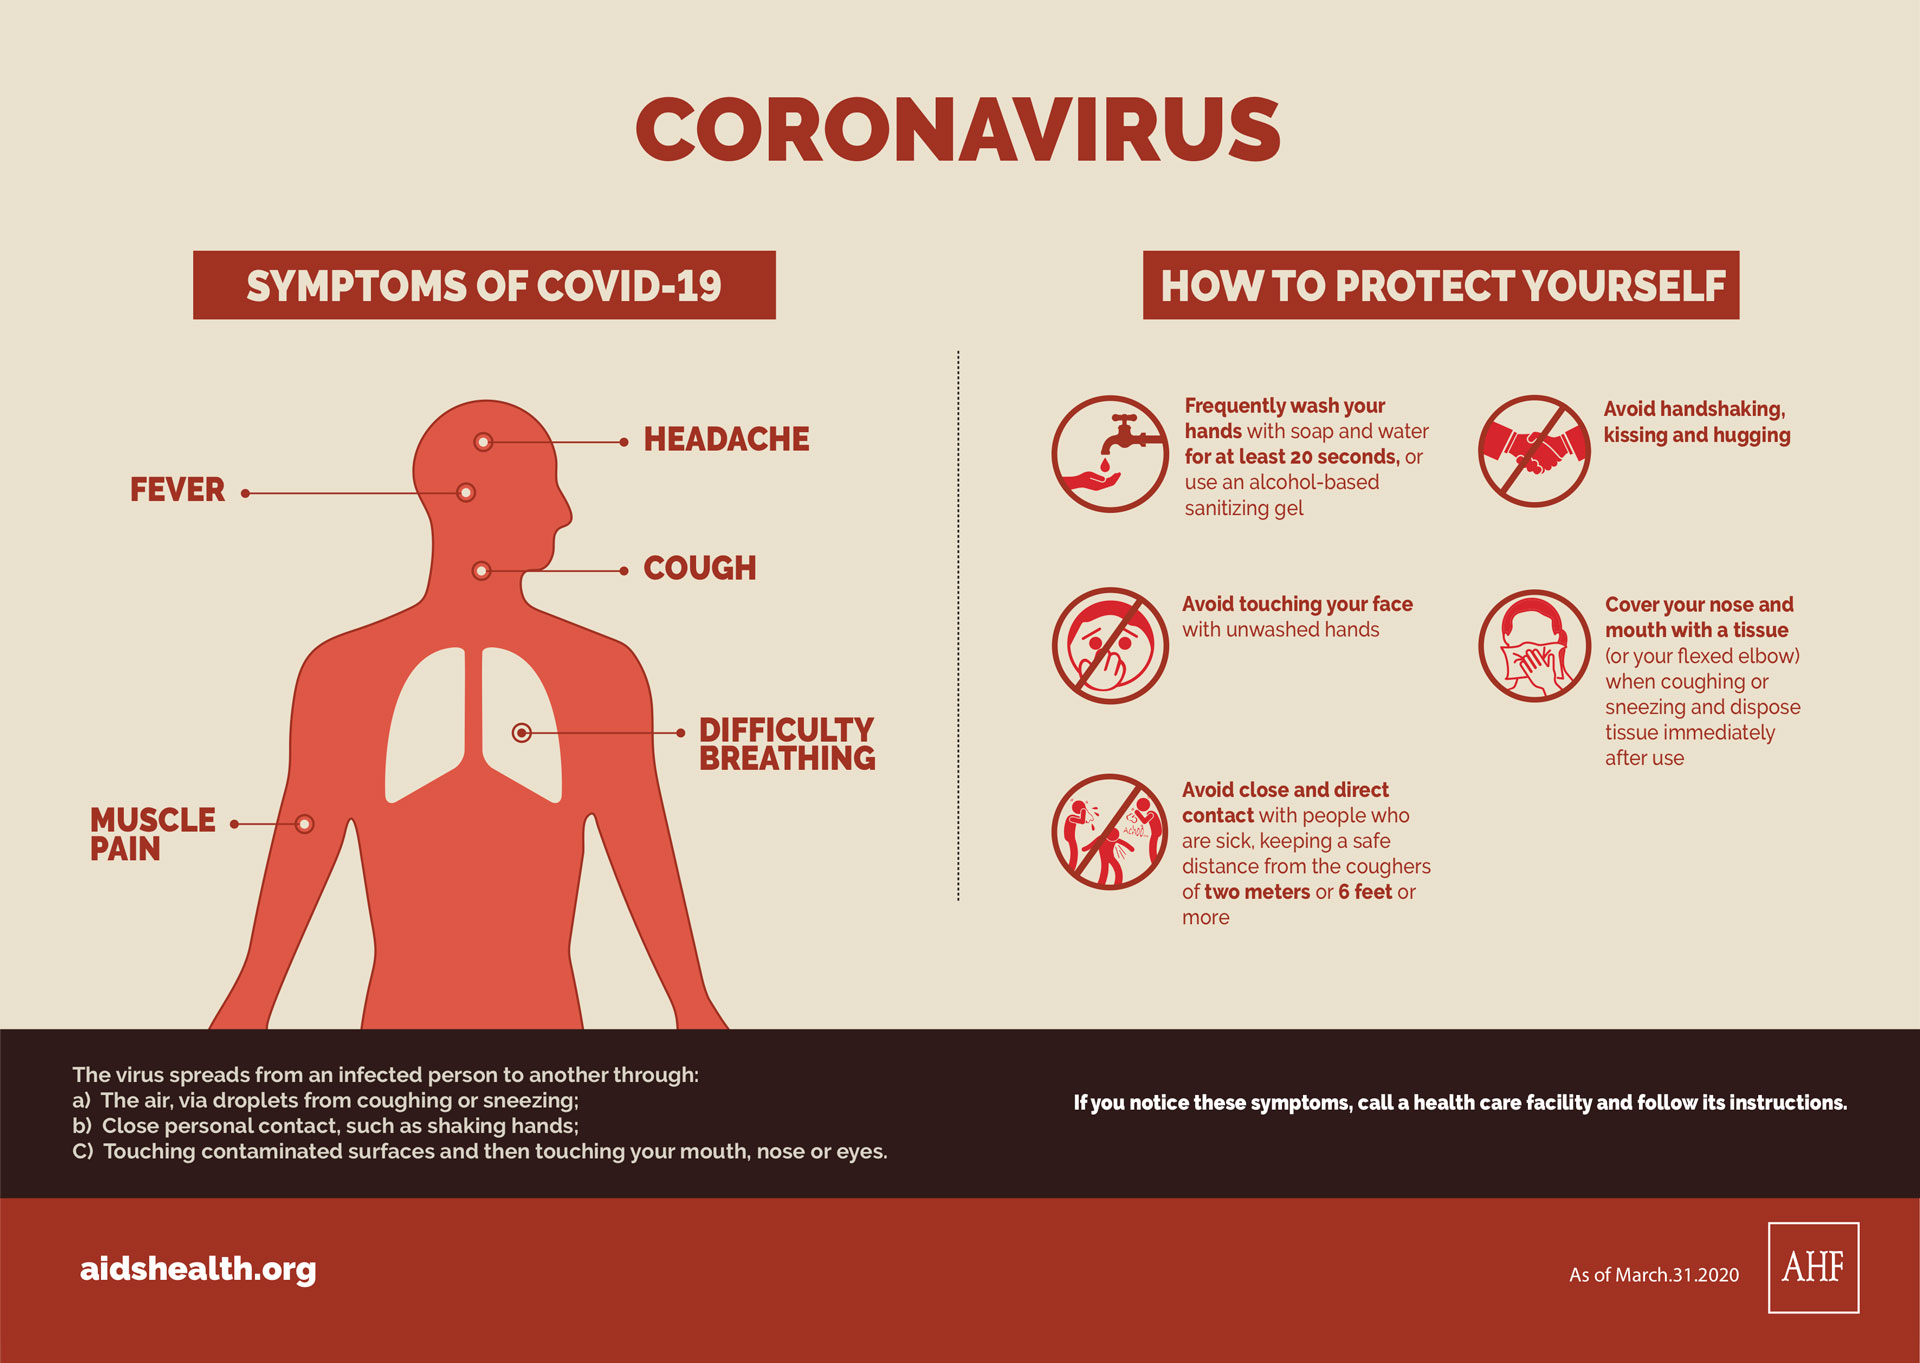 Coronavirus, symptoms and protect methods